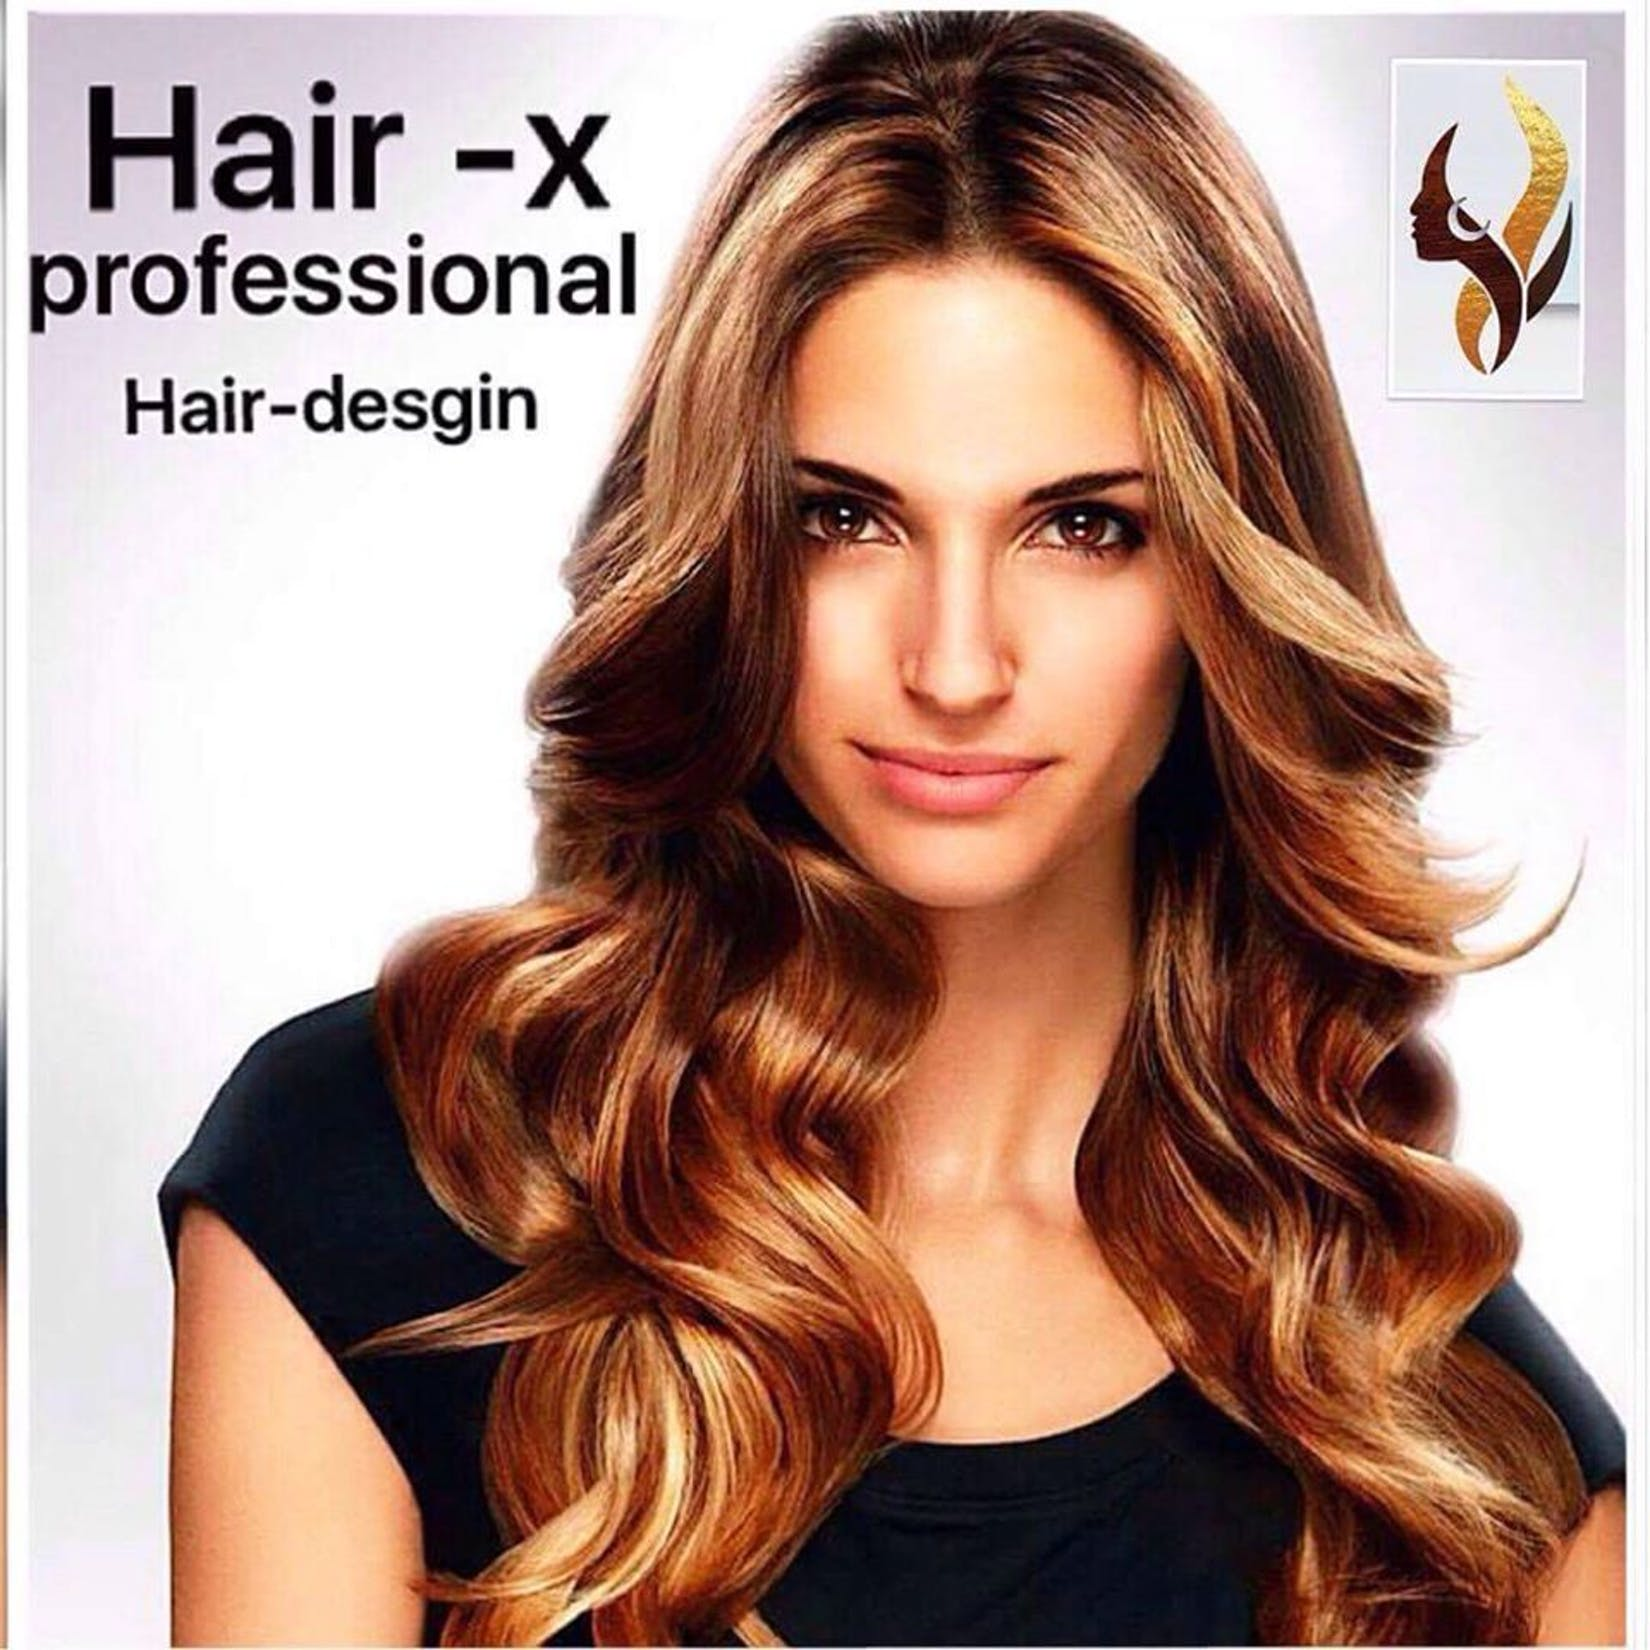 Hair - X Professional Hair Design | Beauty